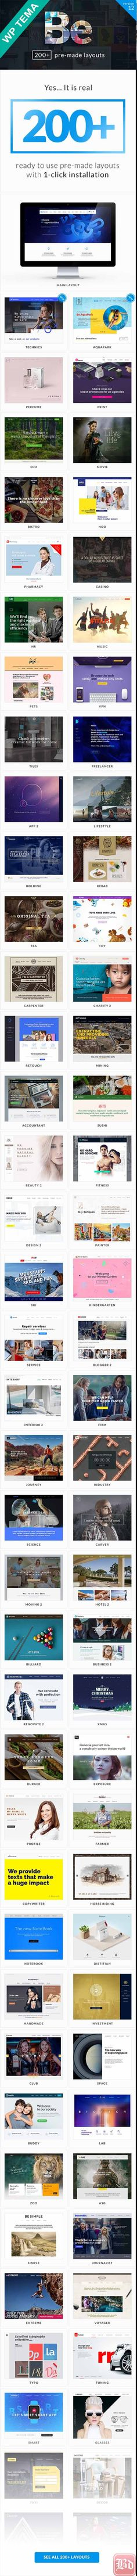 ThemeForest – BeTheme v12.8 – Responsive Multi-Purpose WordPress Theme – 7758048